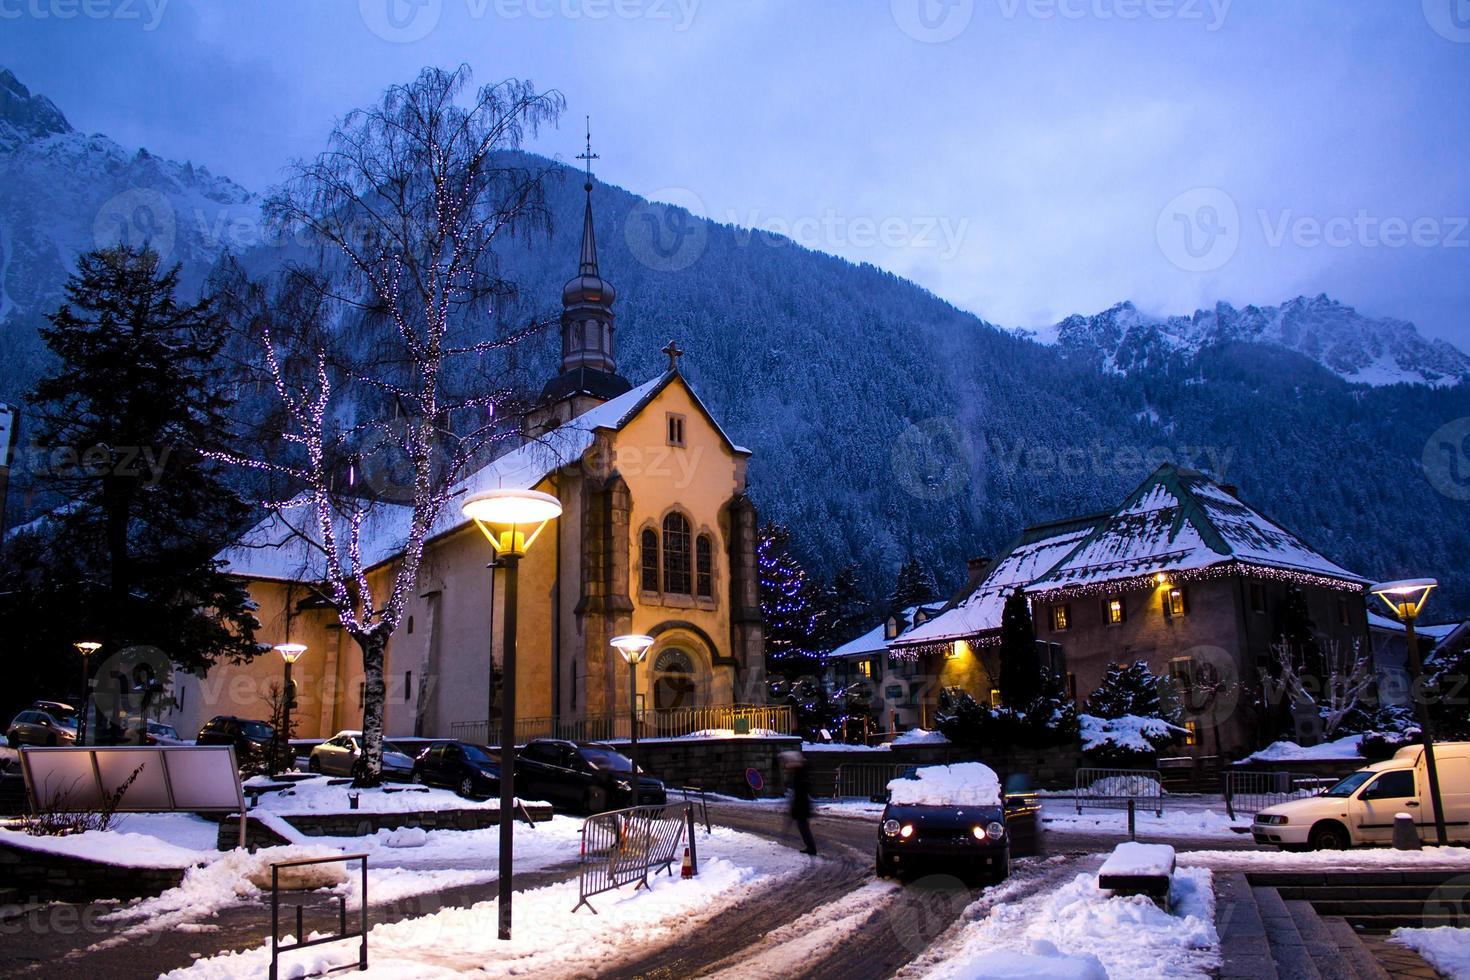 Chamonix Stadt foto